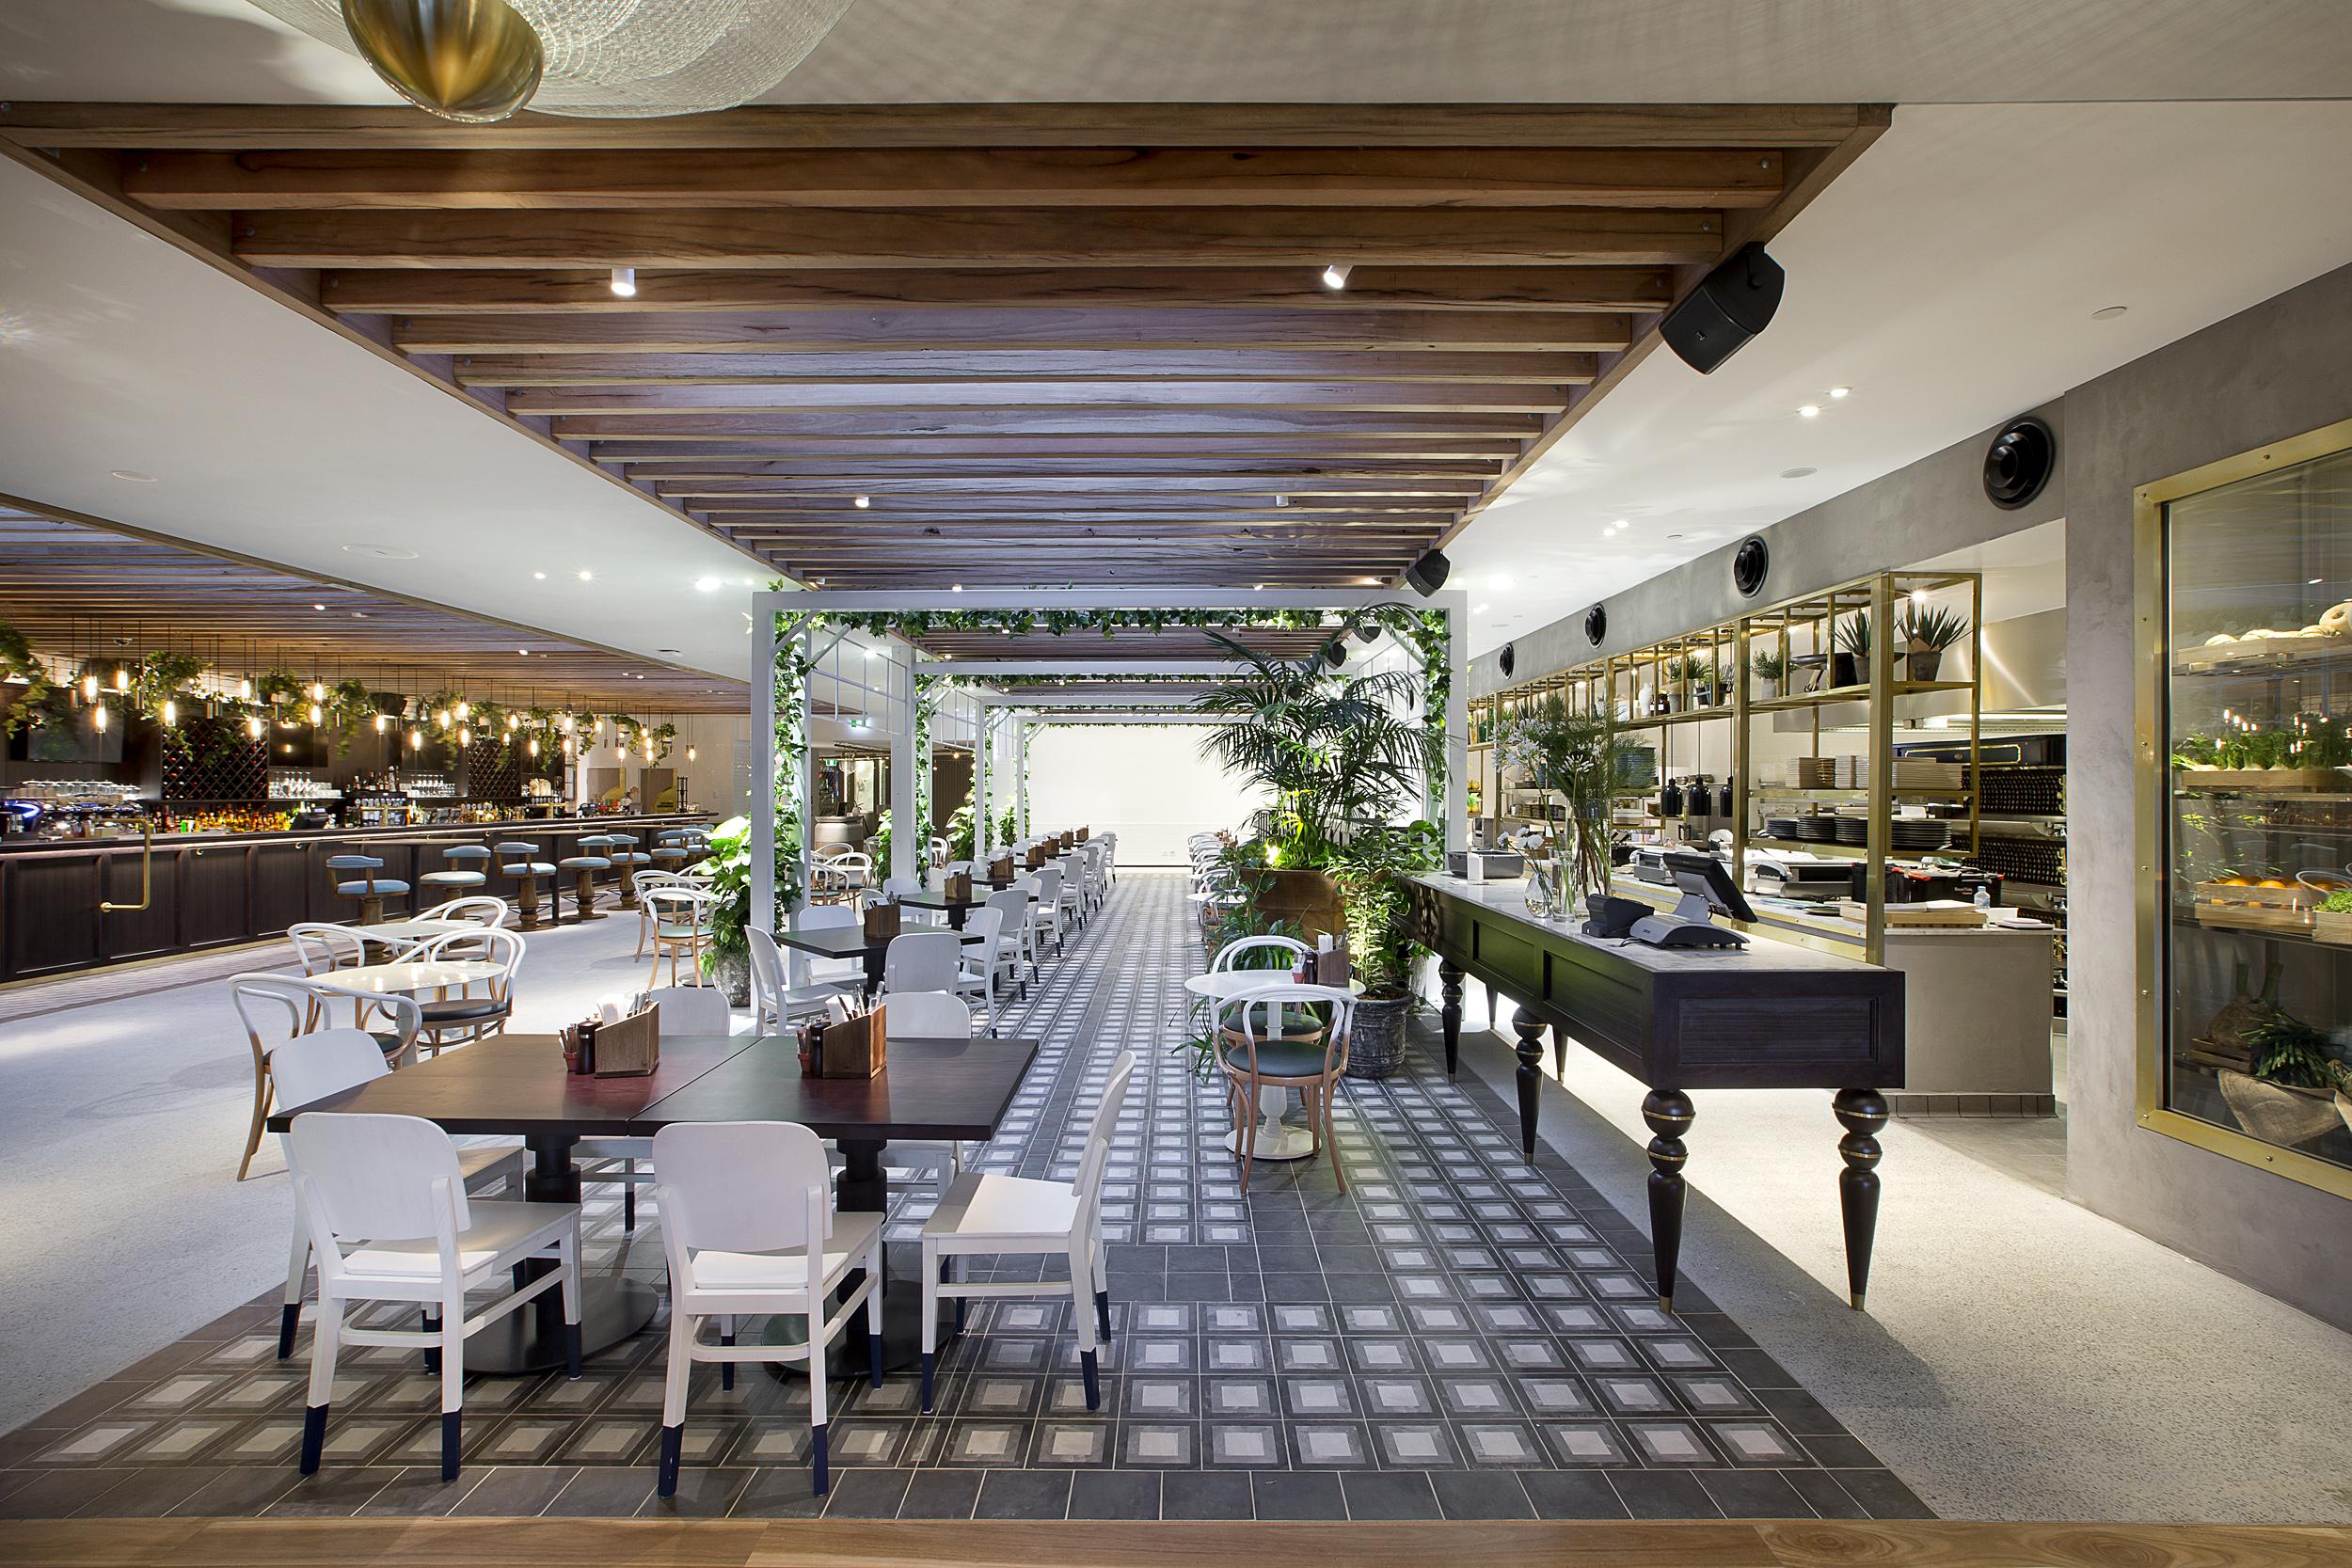 New local restaurant showcasing world class design cedar suede - Bar area in kitchen ...